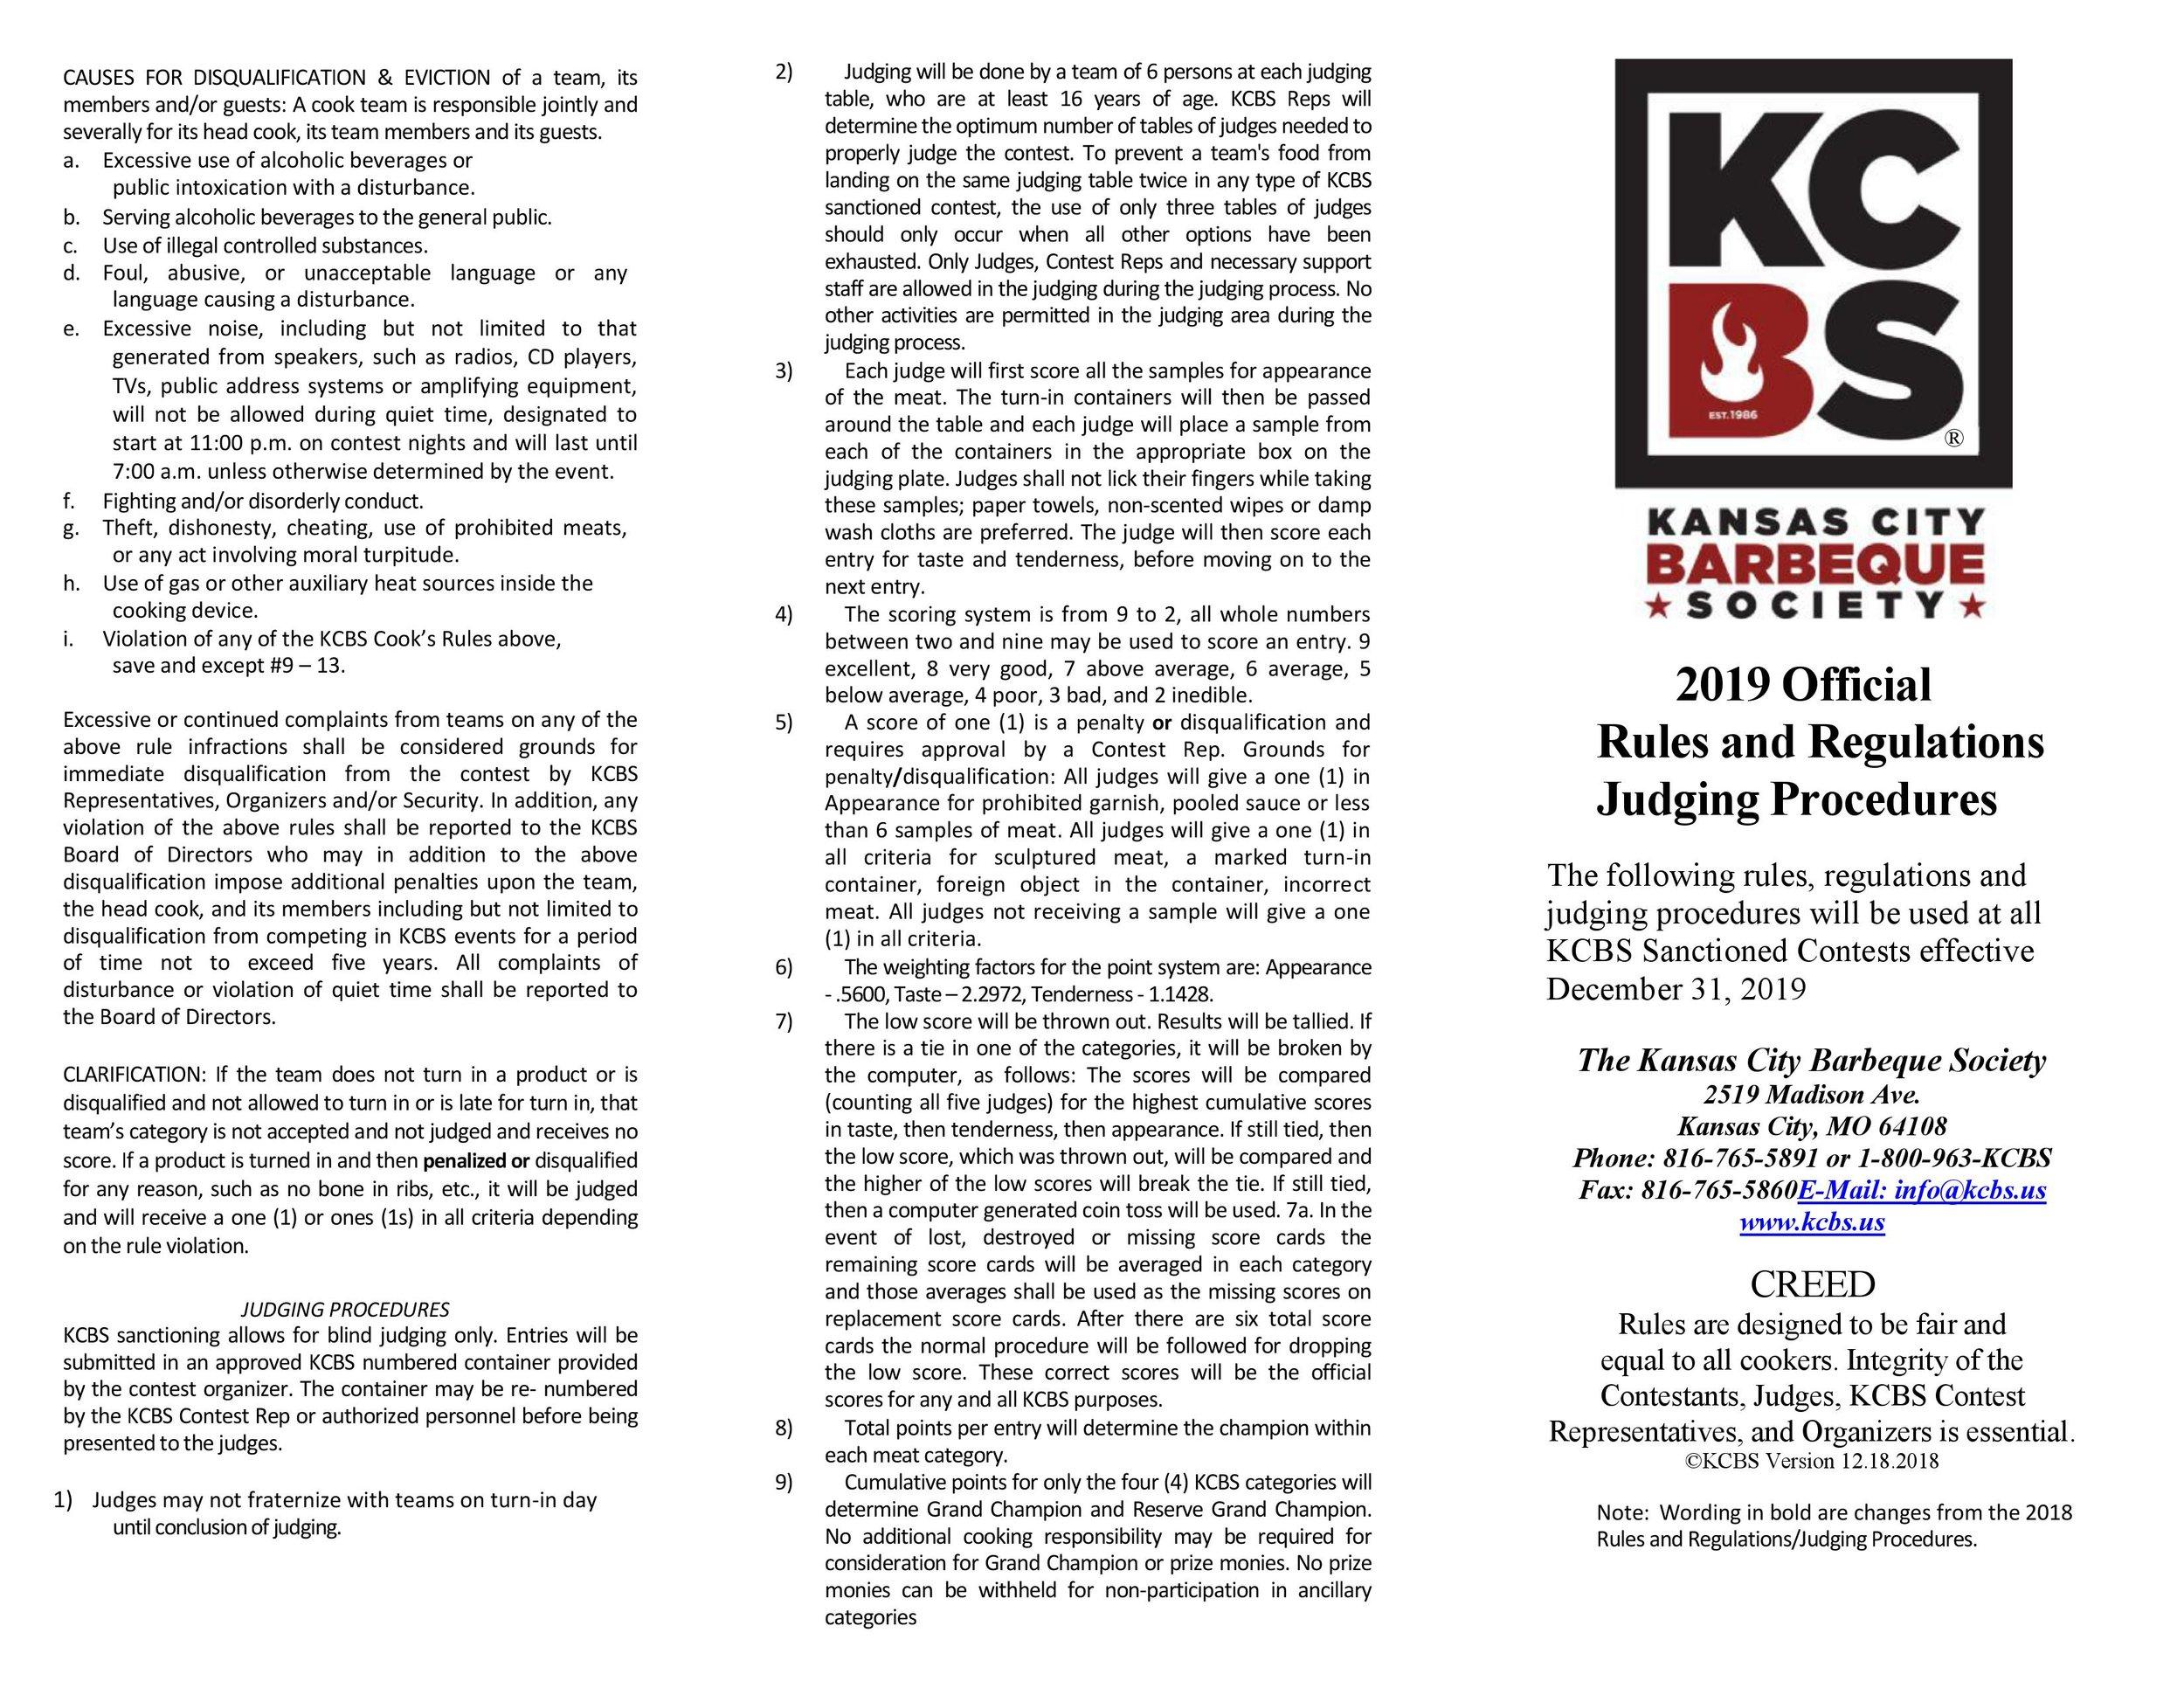 KCBS_Rules_2019_2.jpg